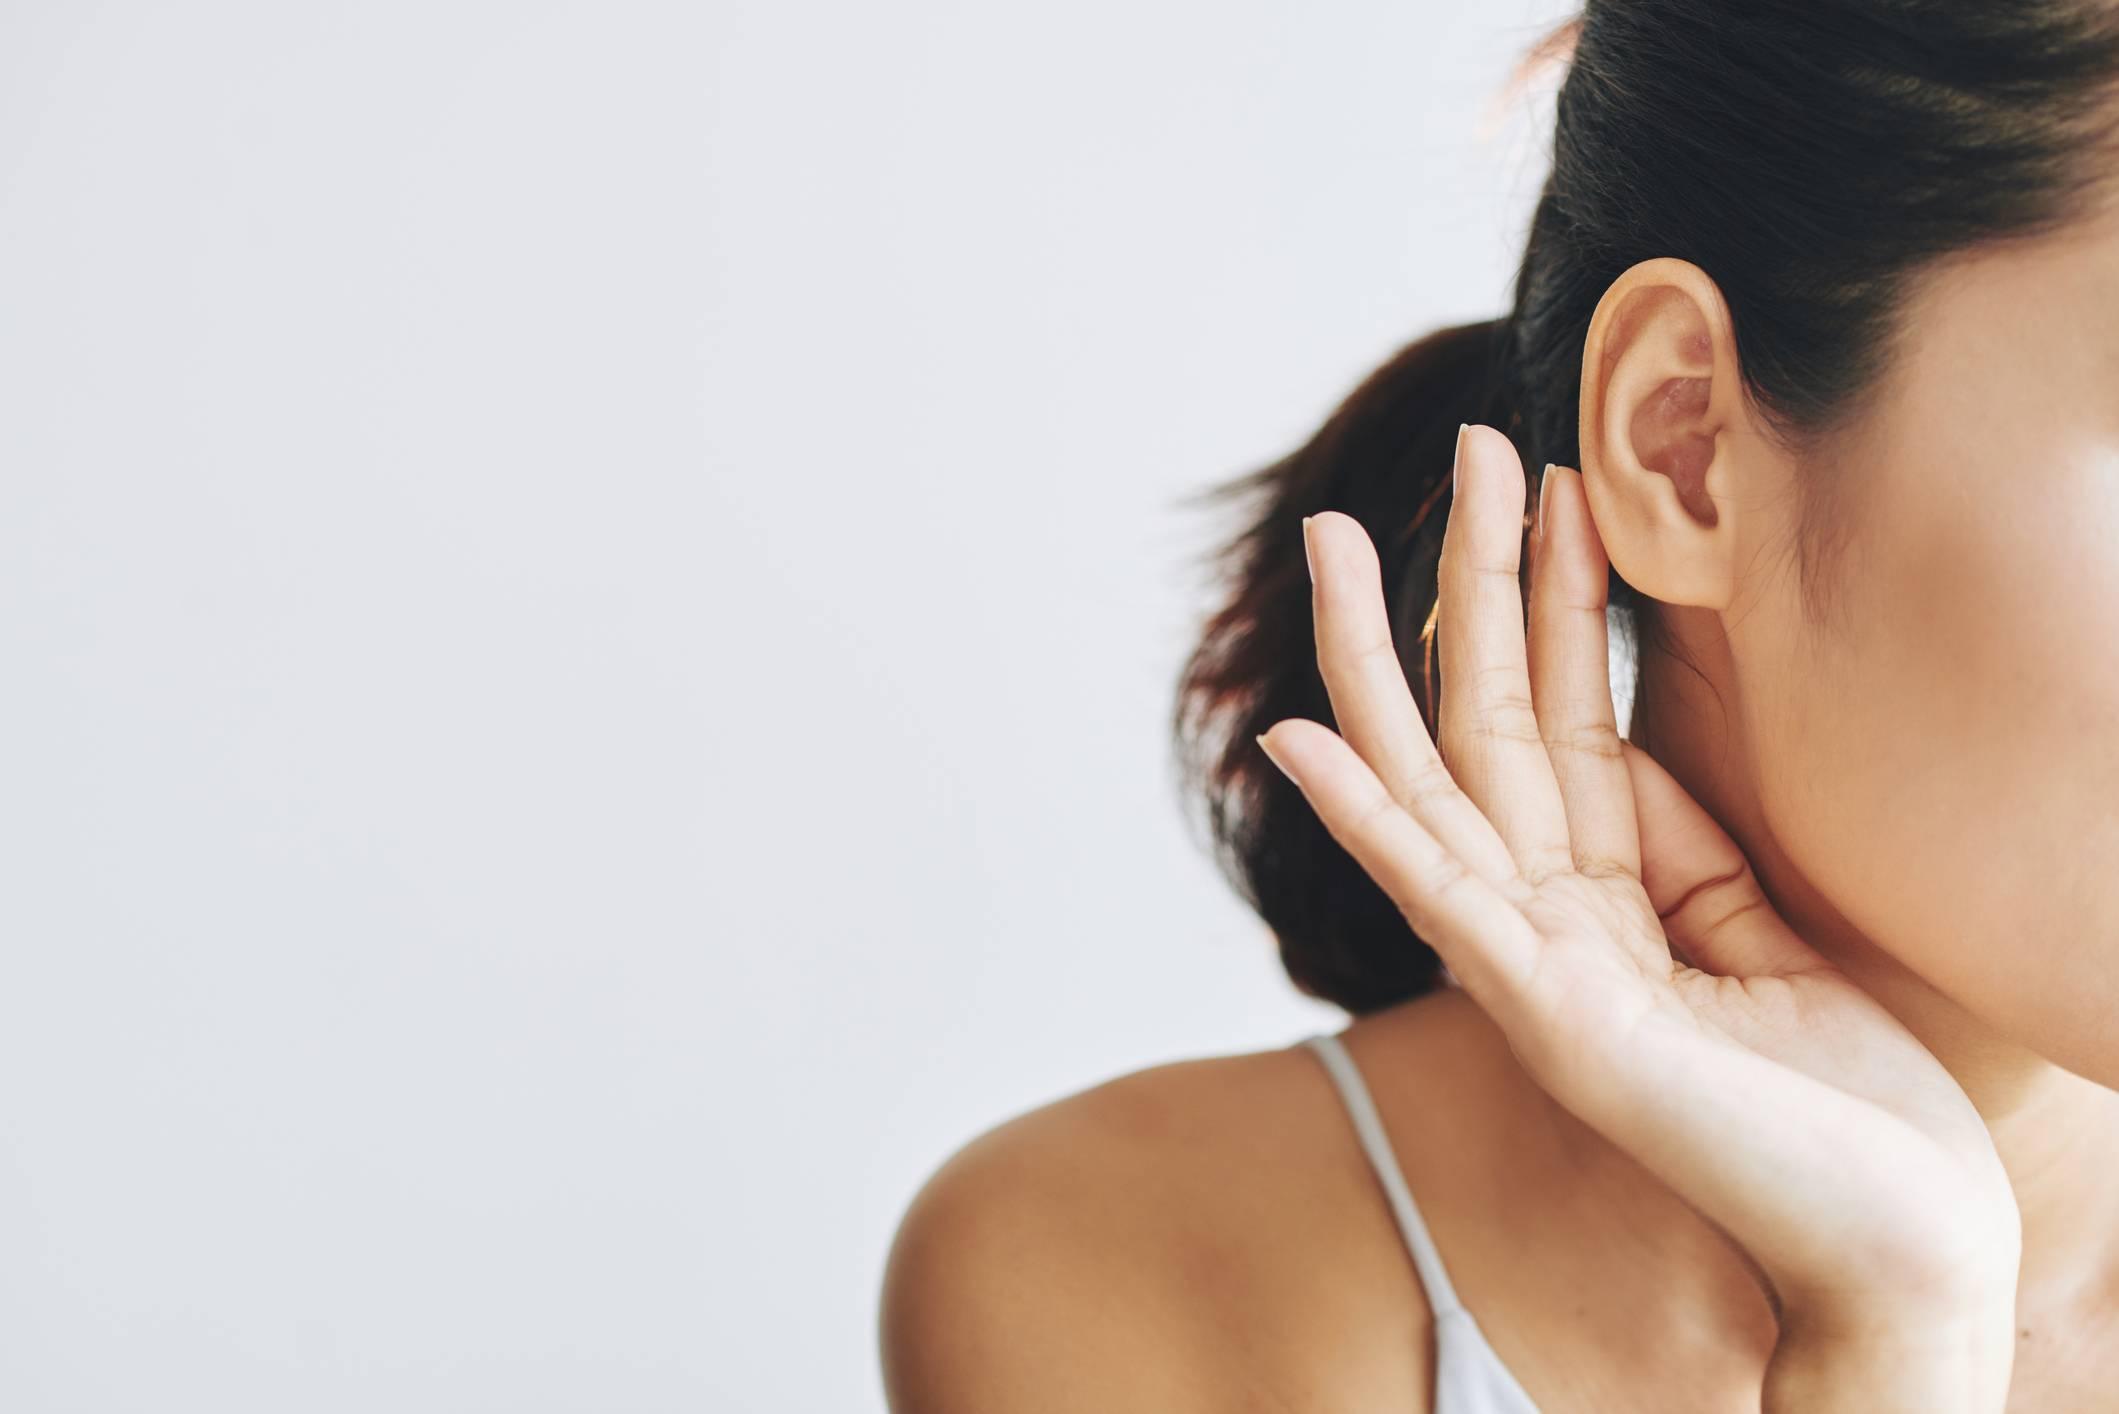 Почему появляется шишка за ухом у ребенка